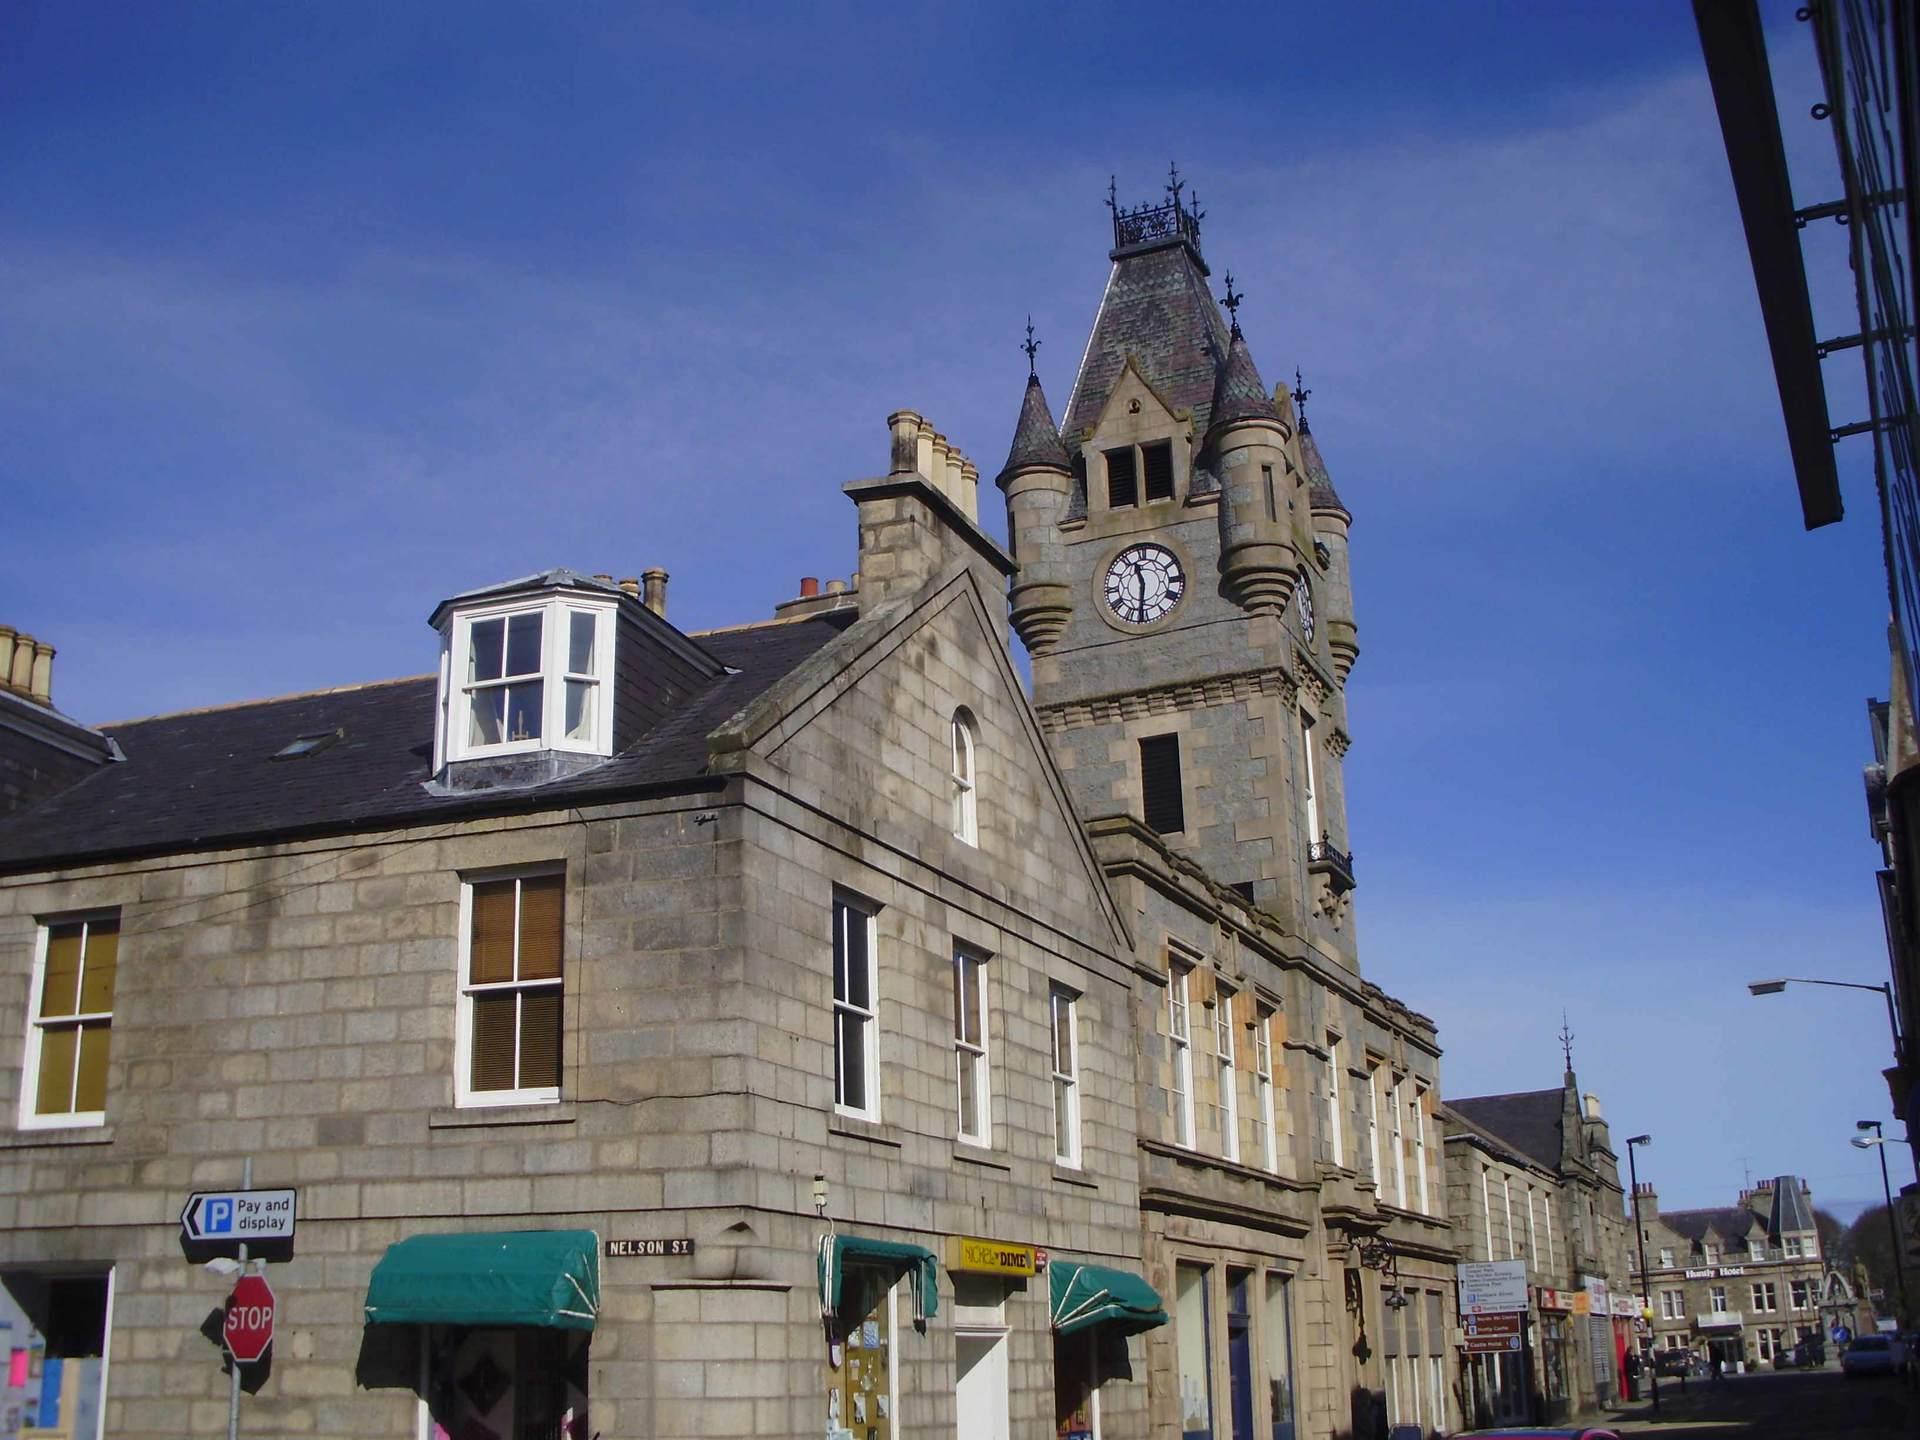 Huntly, Aberdeenshire